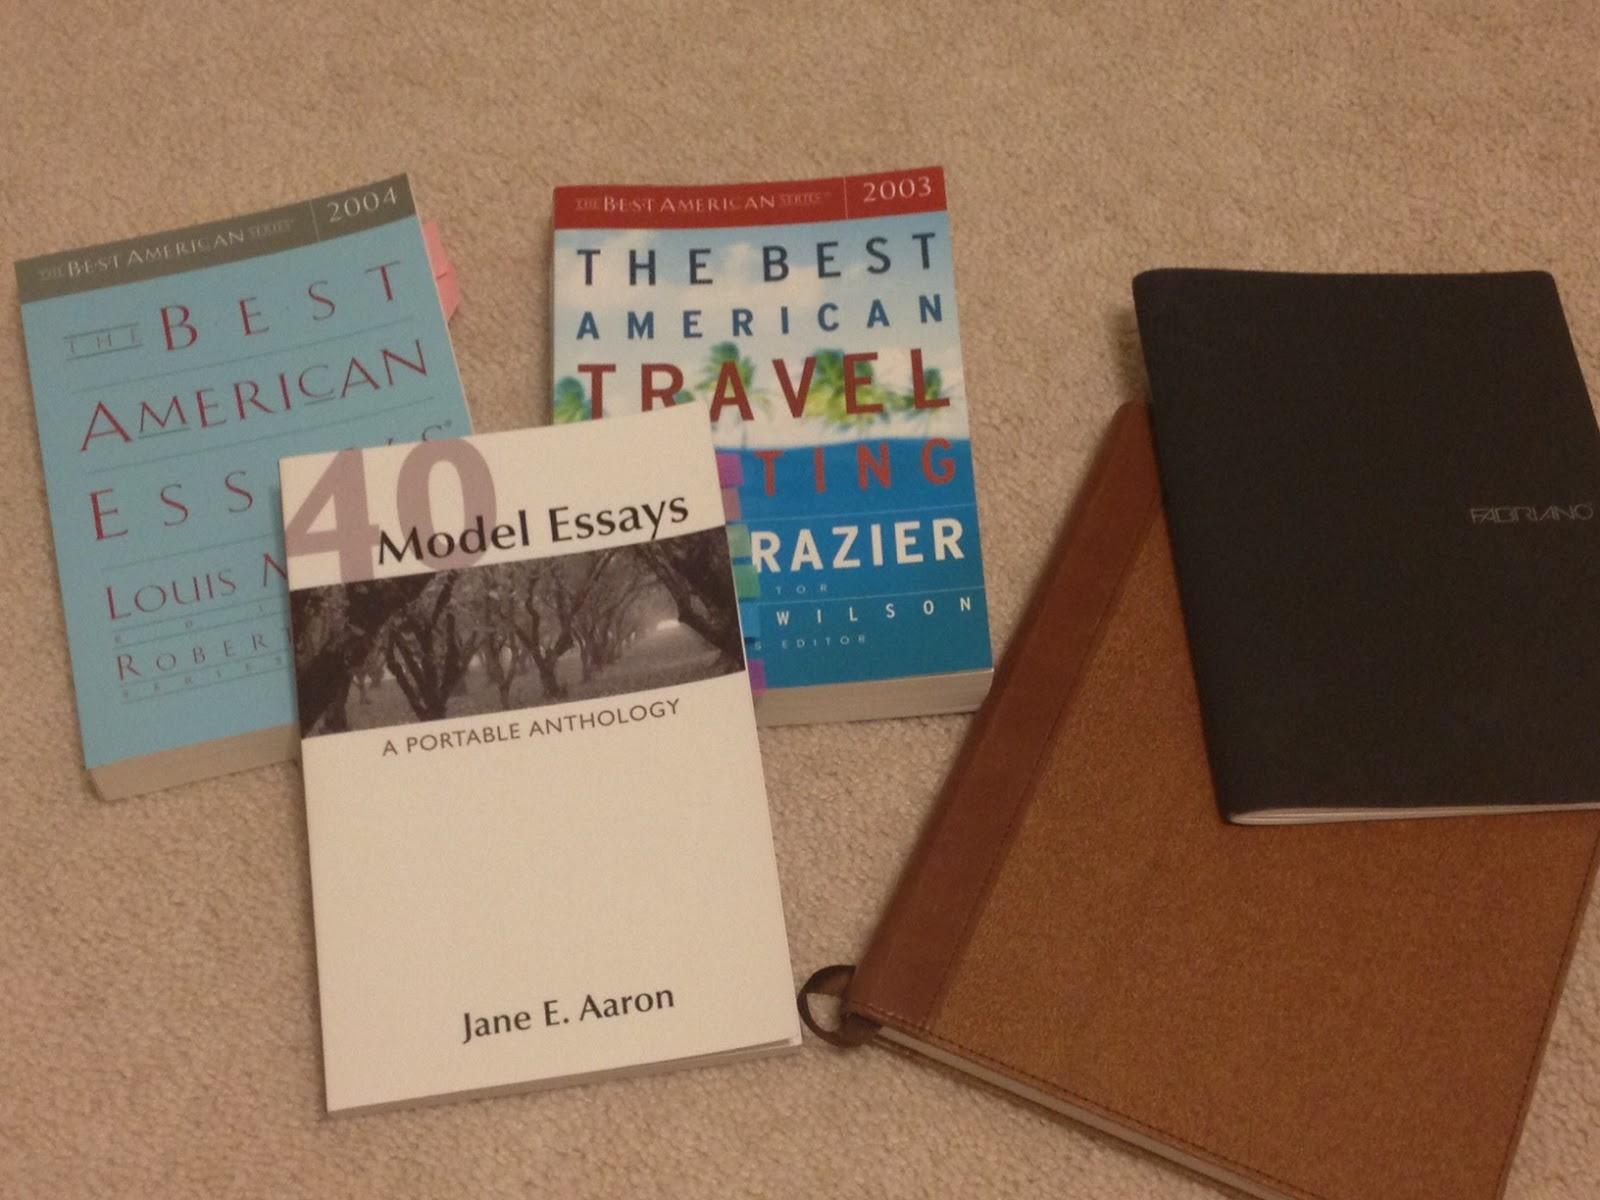 40 model essays a portable anthology online